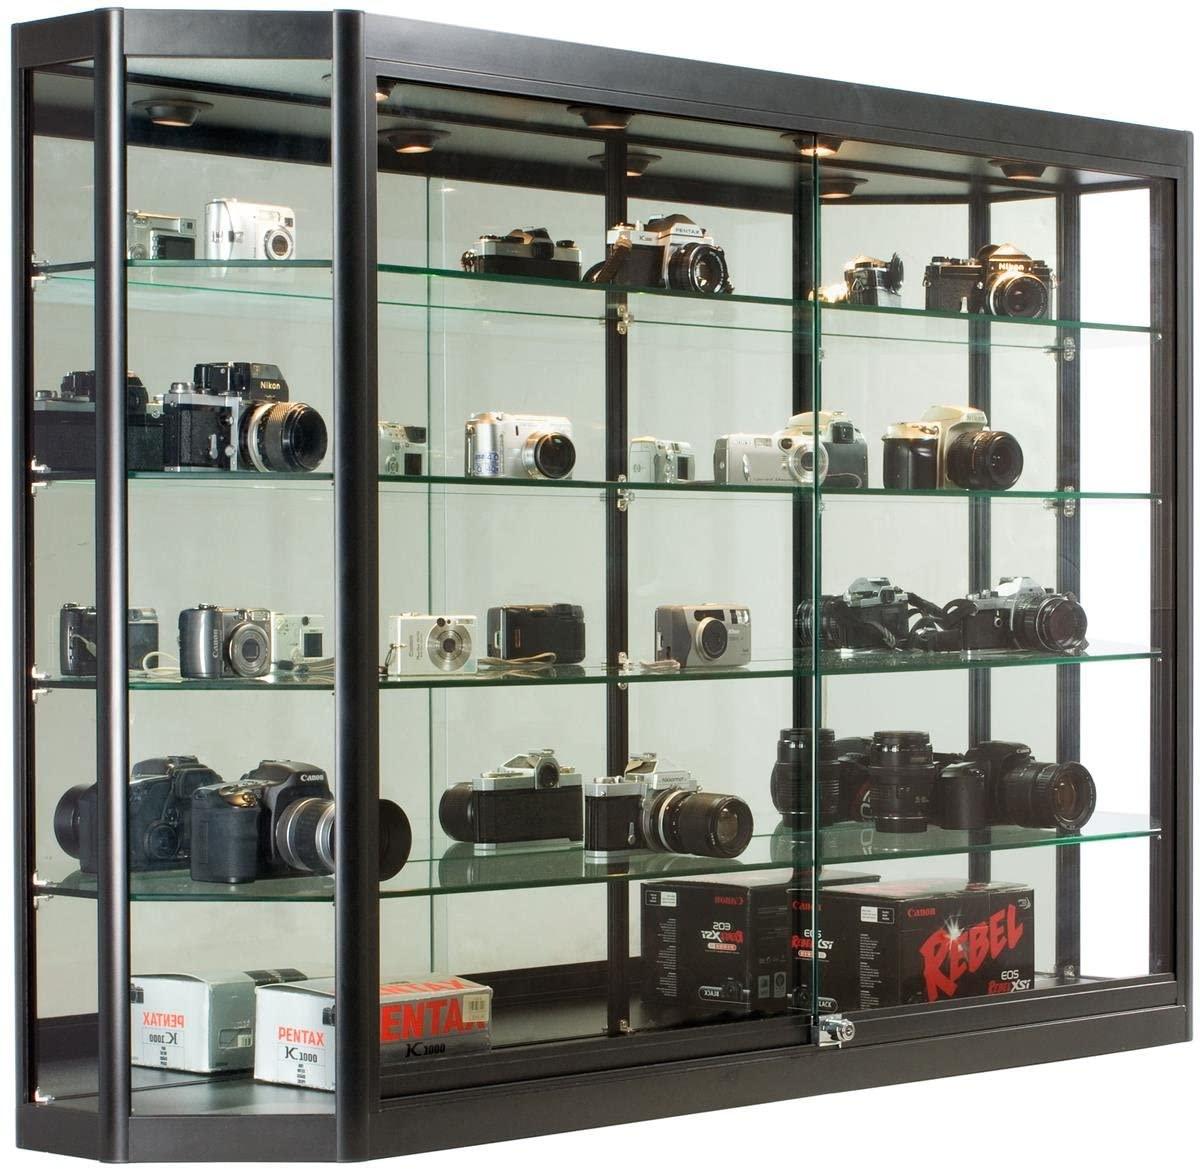 Displays2go 60 x 39.5 Inch Glass Illuminated Showcase for Wall Mount, Locking Sliding Doors, Aluminum Construction – Black (WC603912BK)